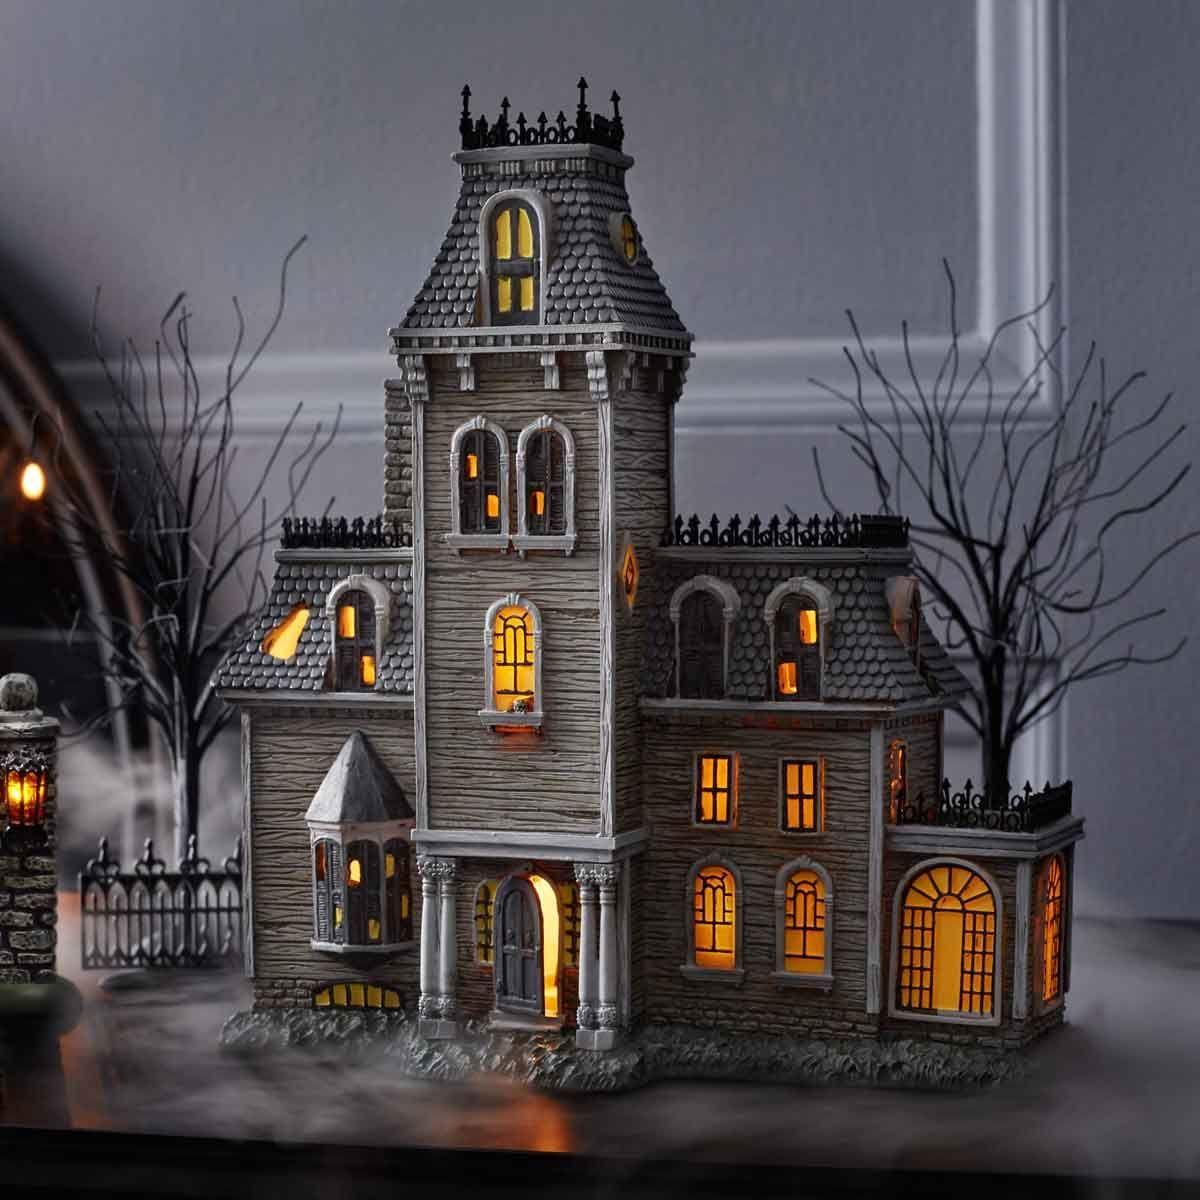 The Addams Family House Addams family house, Spooky